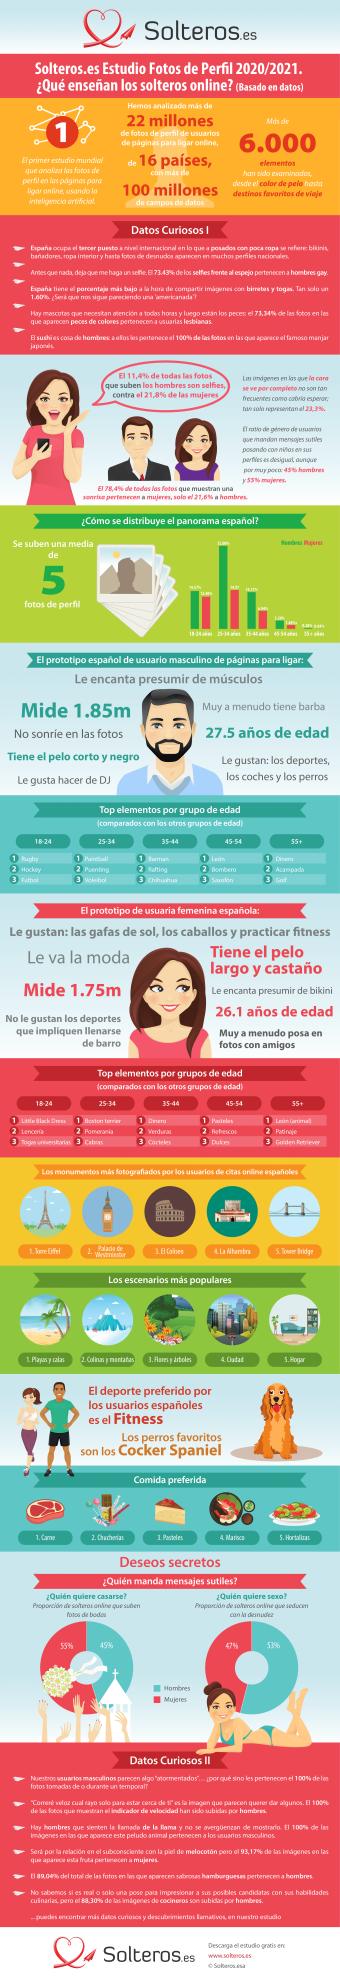 Infografia Solteros.es Estudio Solteros Online